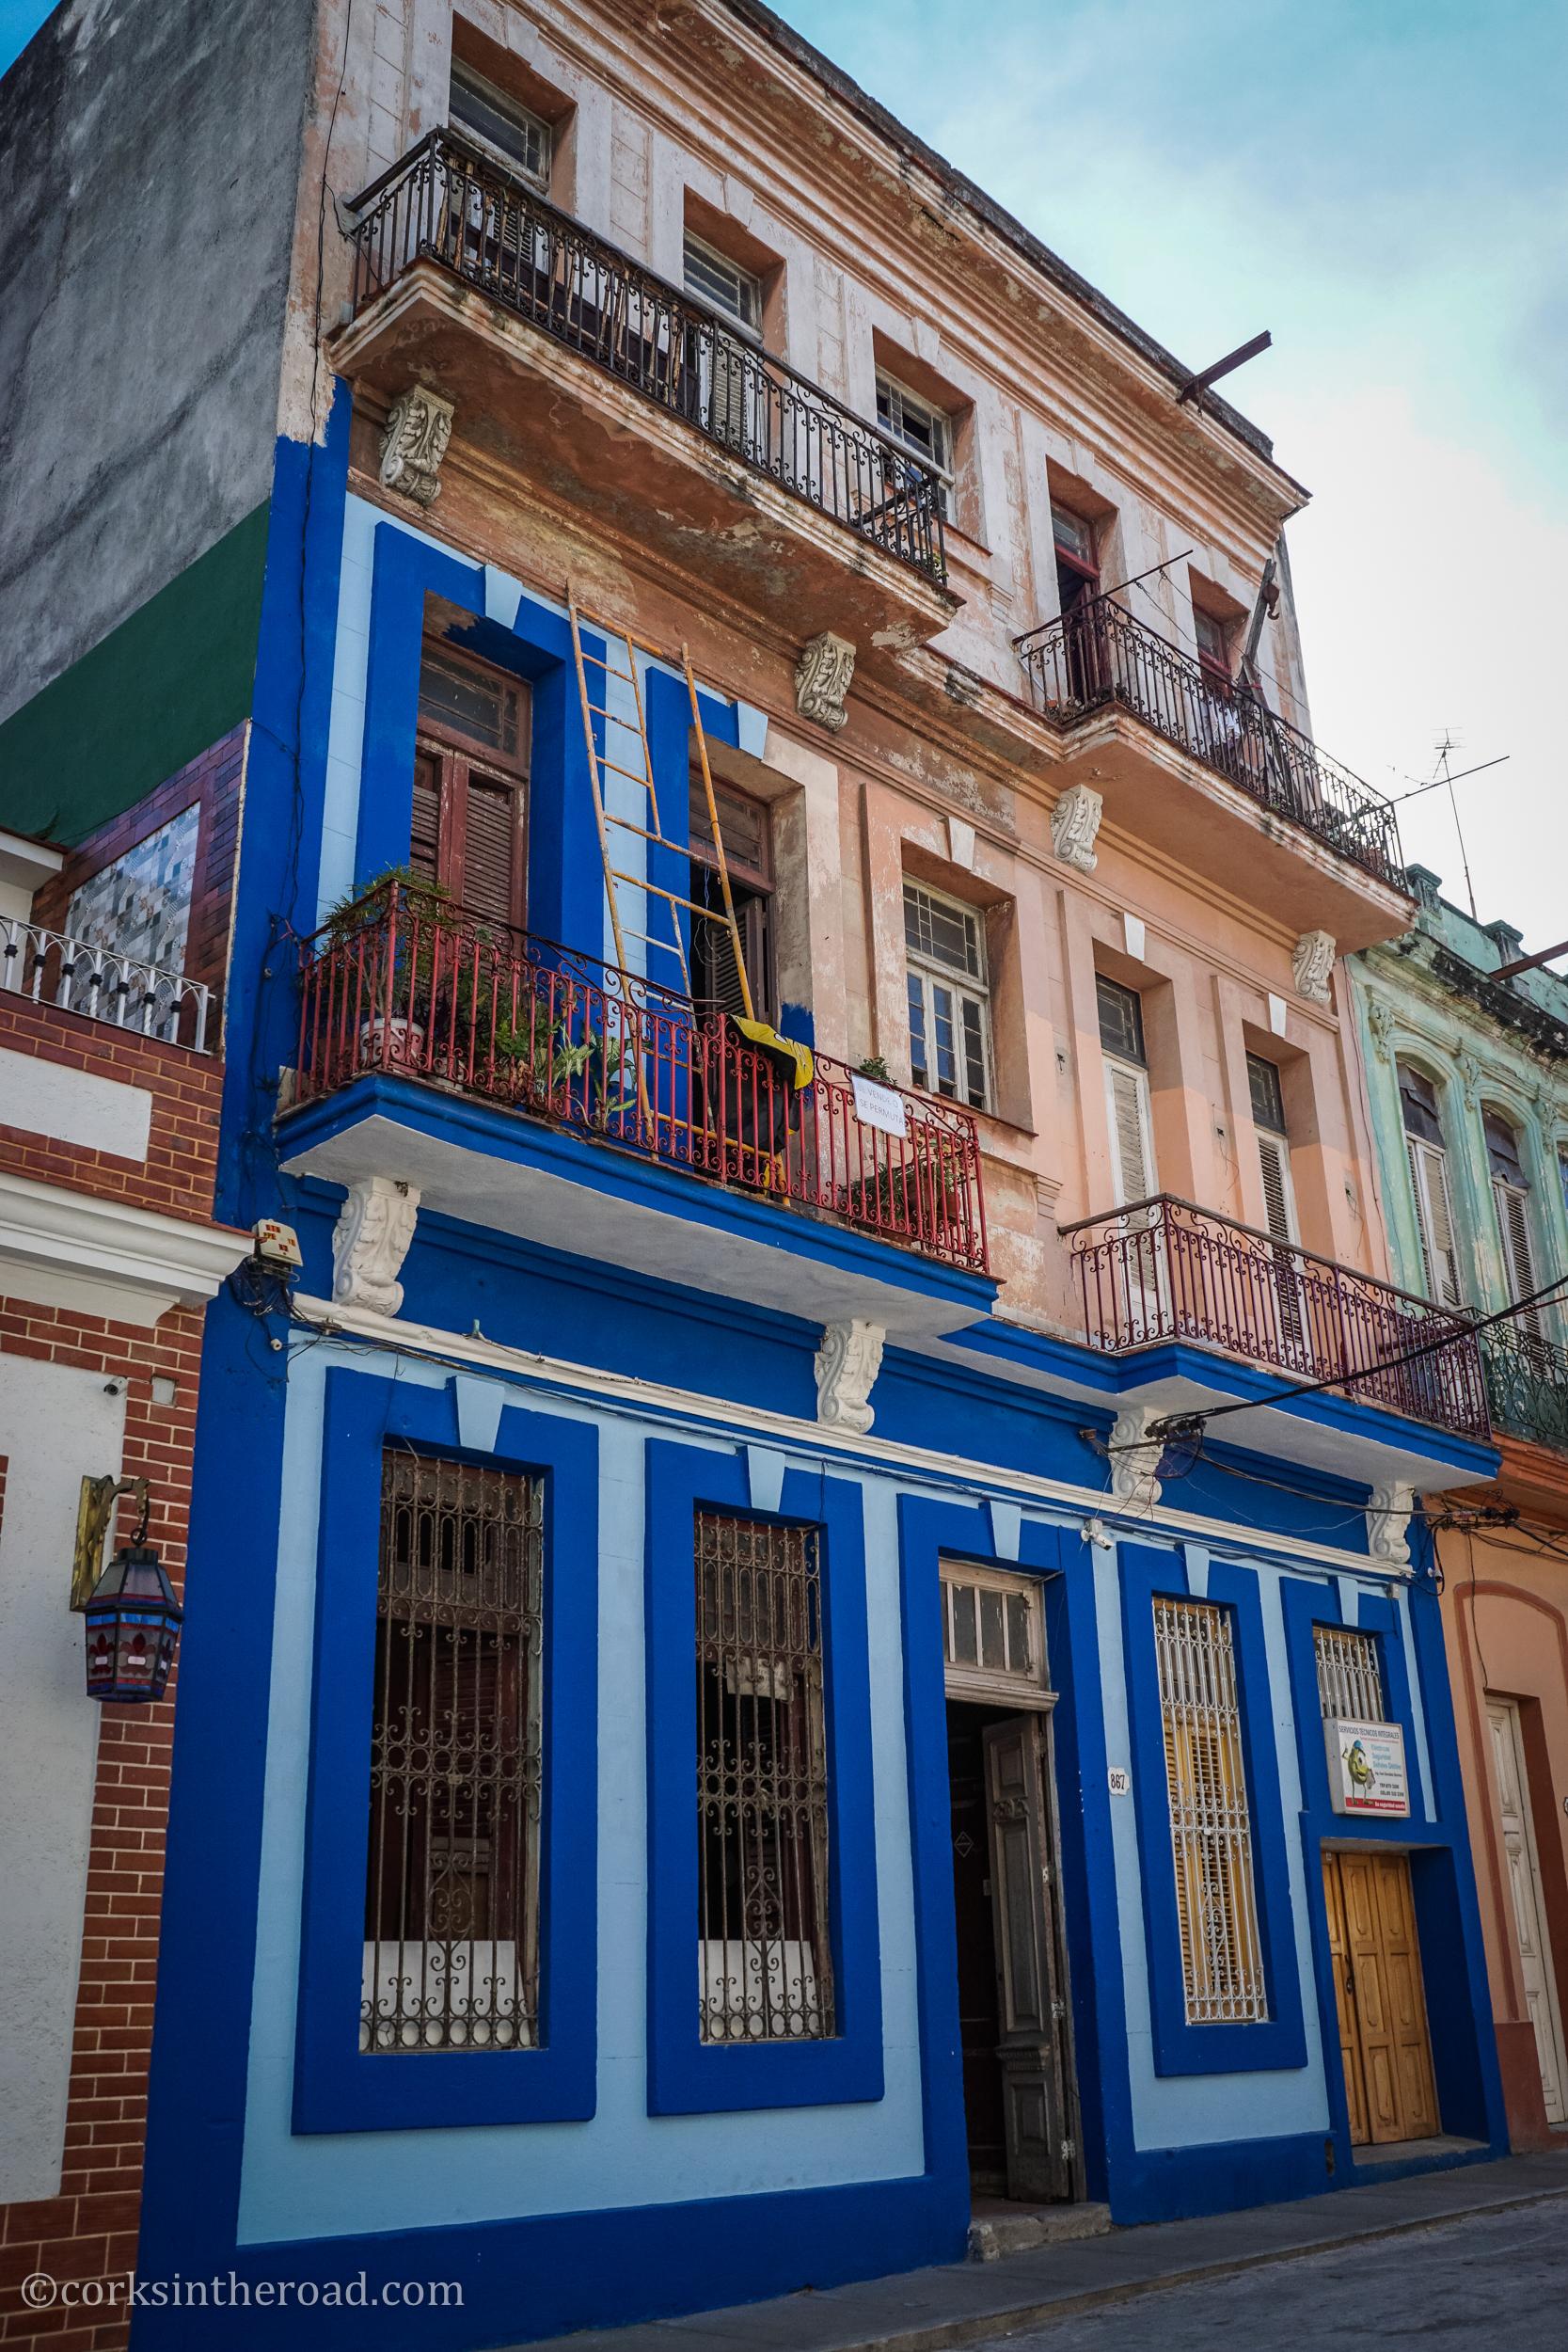 Architecture, Corksintheroad, Cuba, Havana-14.jpg